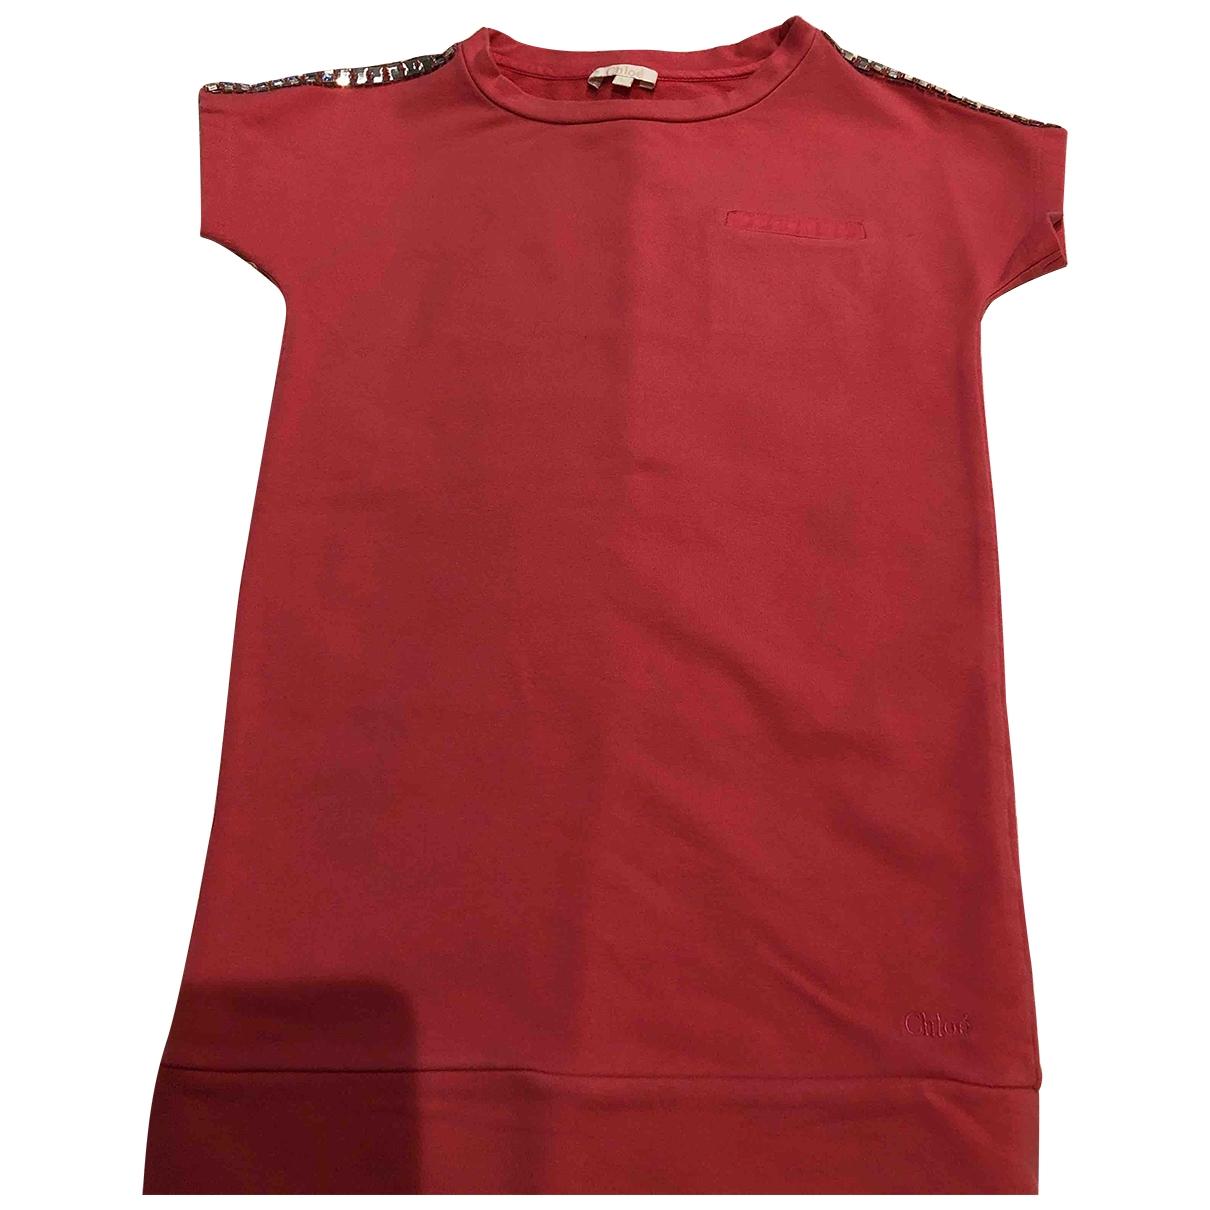 Chloe - Robe    pour enfant en coton - rose